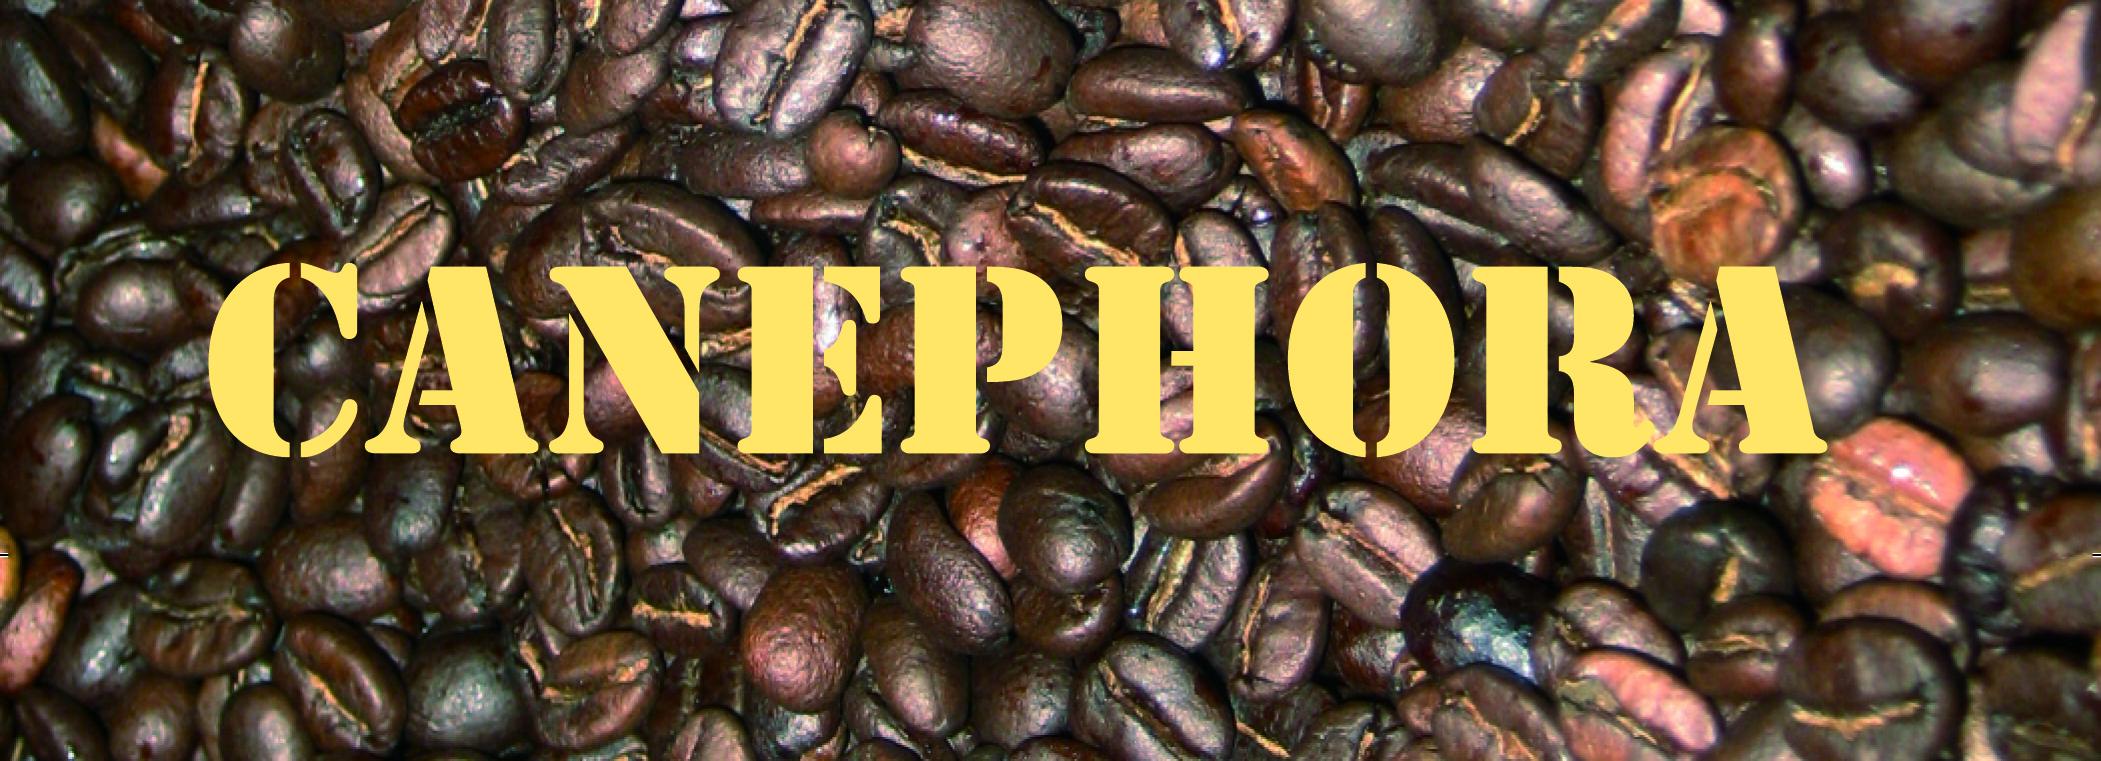 canephora